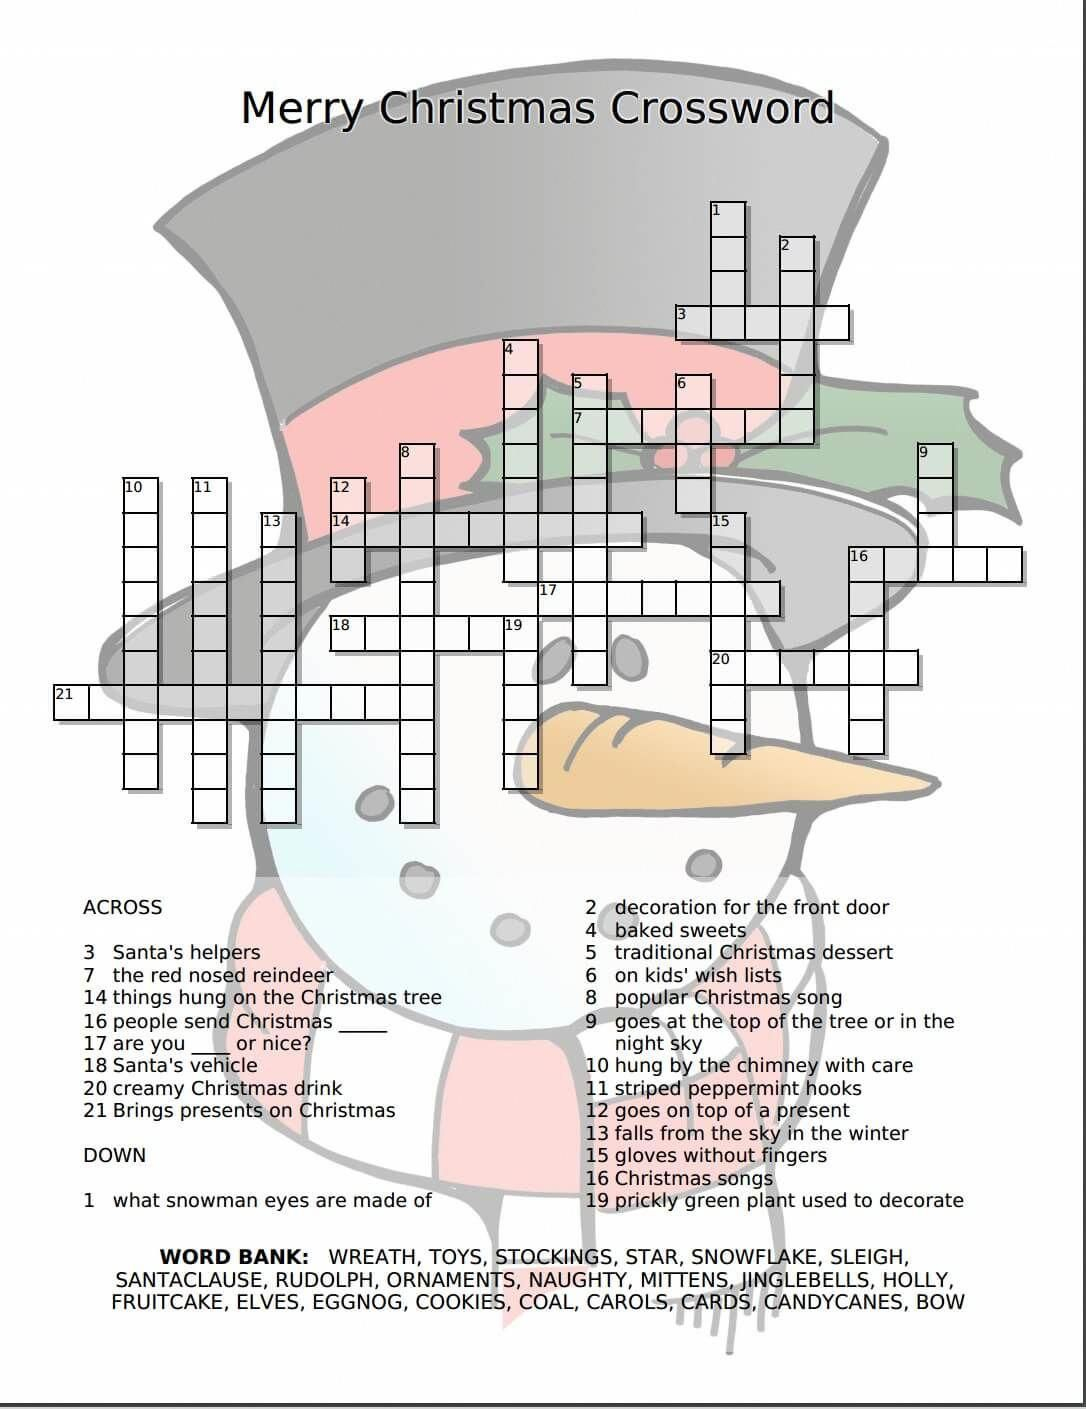 Merry Christmas Crossword Free Printable - | Love Christmastime - Free Printable Christmas Puzzle Sheets